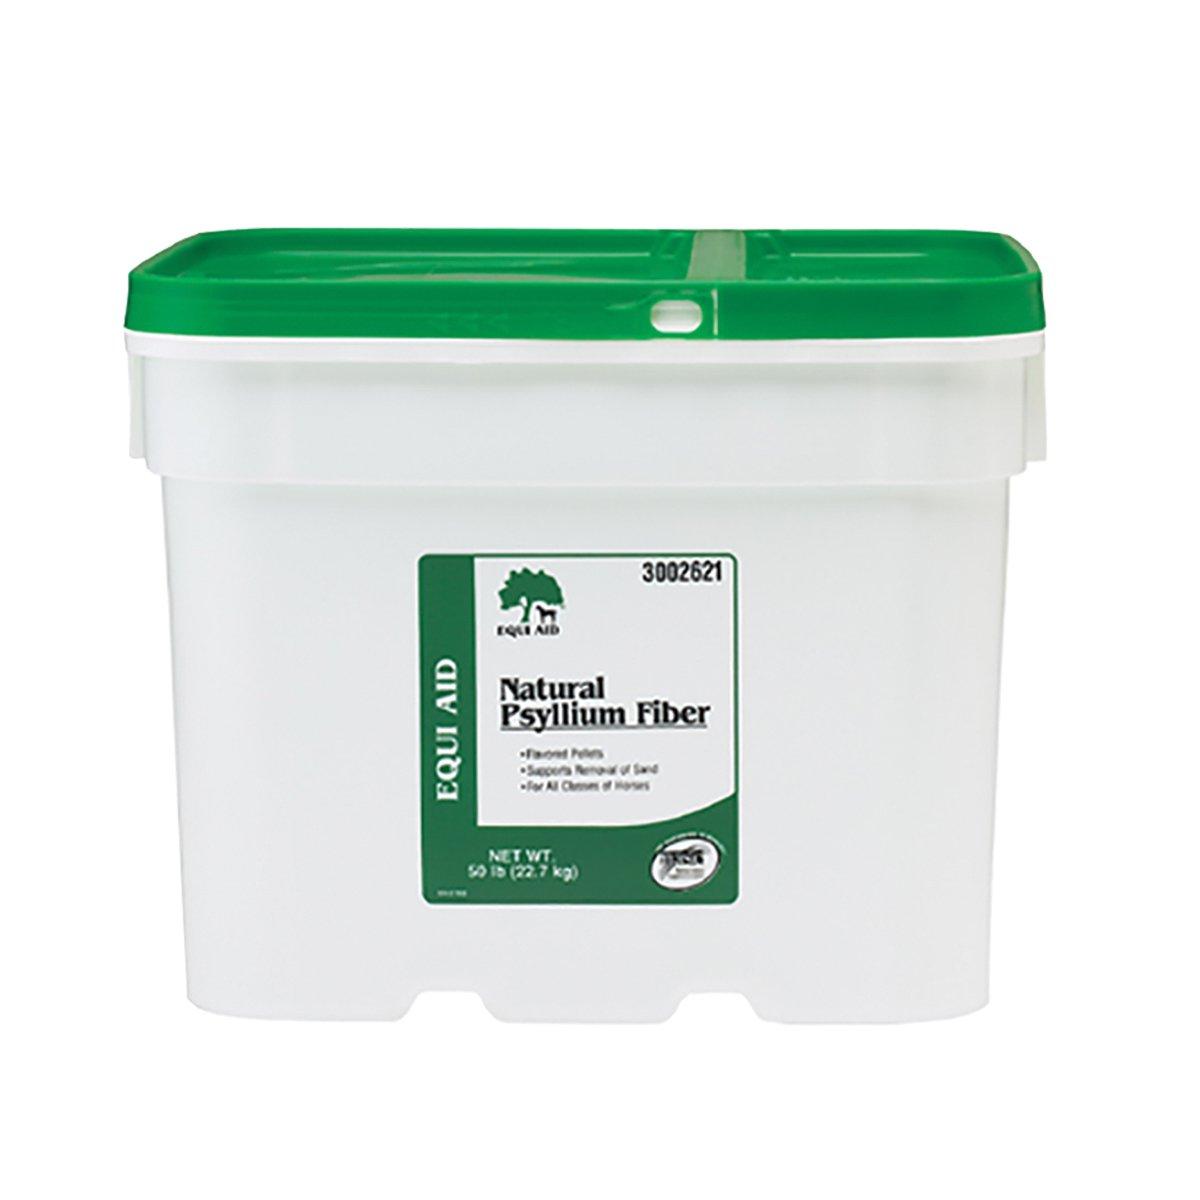 Farnam Equi Aid Natural Psyllium Fiber Pellets, 50 lbs